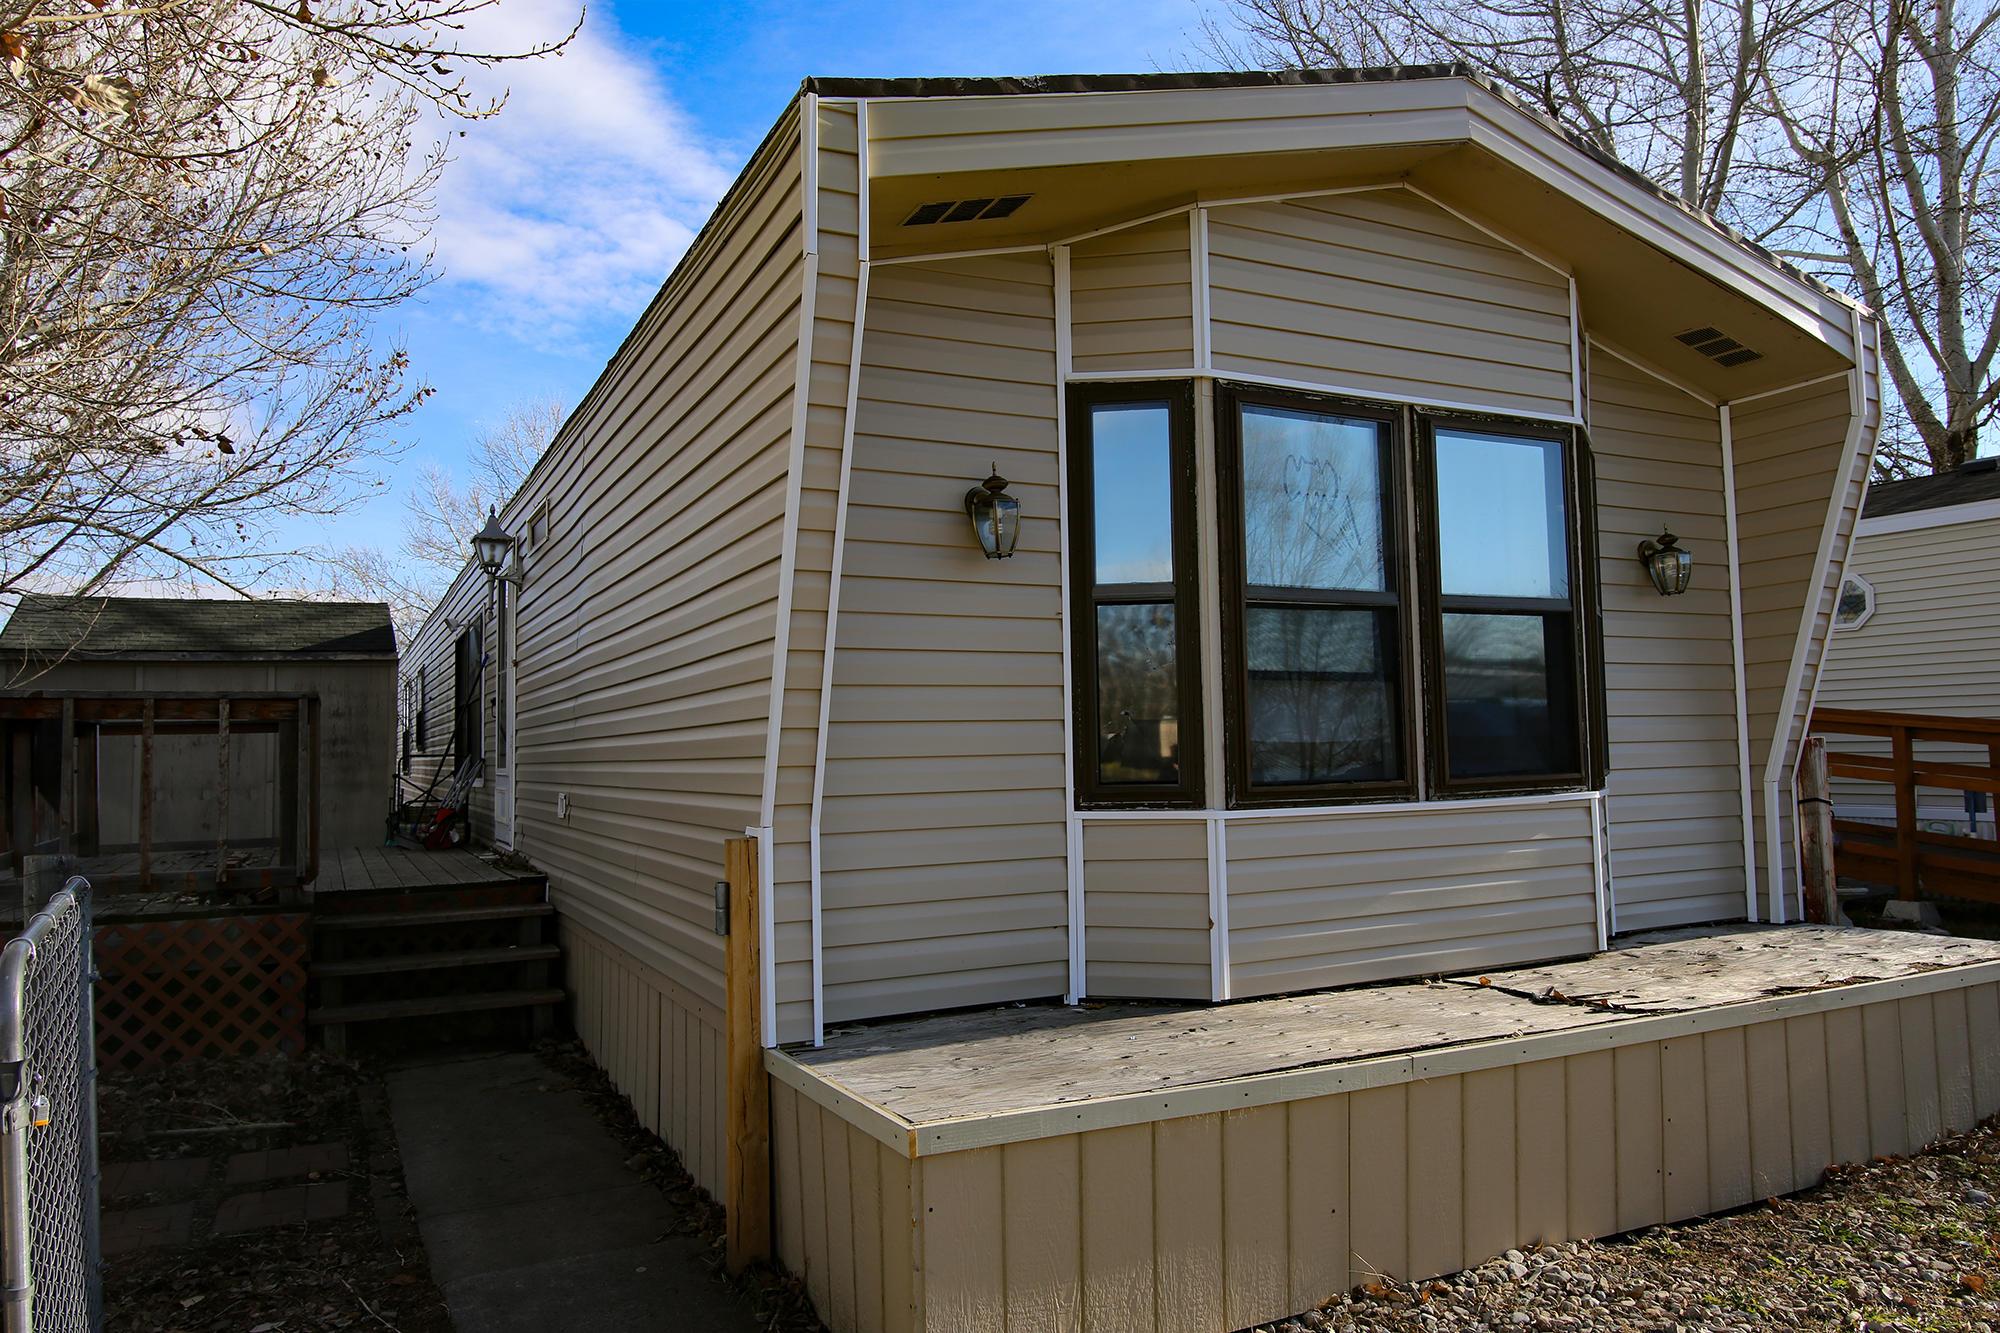 1511 Mydland Road, Sheridan, Wyoming 82801, 2 Bedrooms Bedrooms, ,2 BathroomsBathrooms,Residential,For Sale,Mydland,18-1199